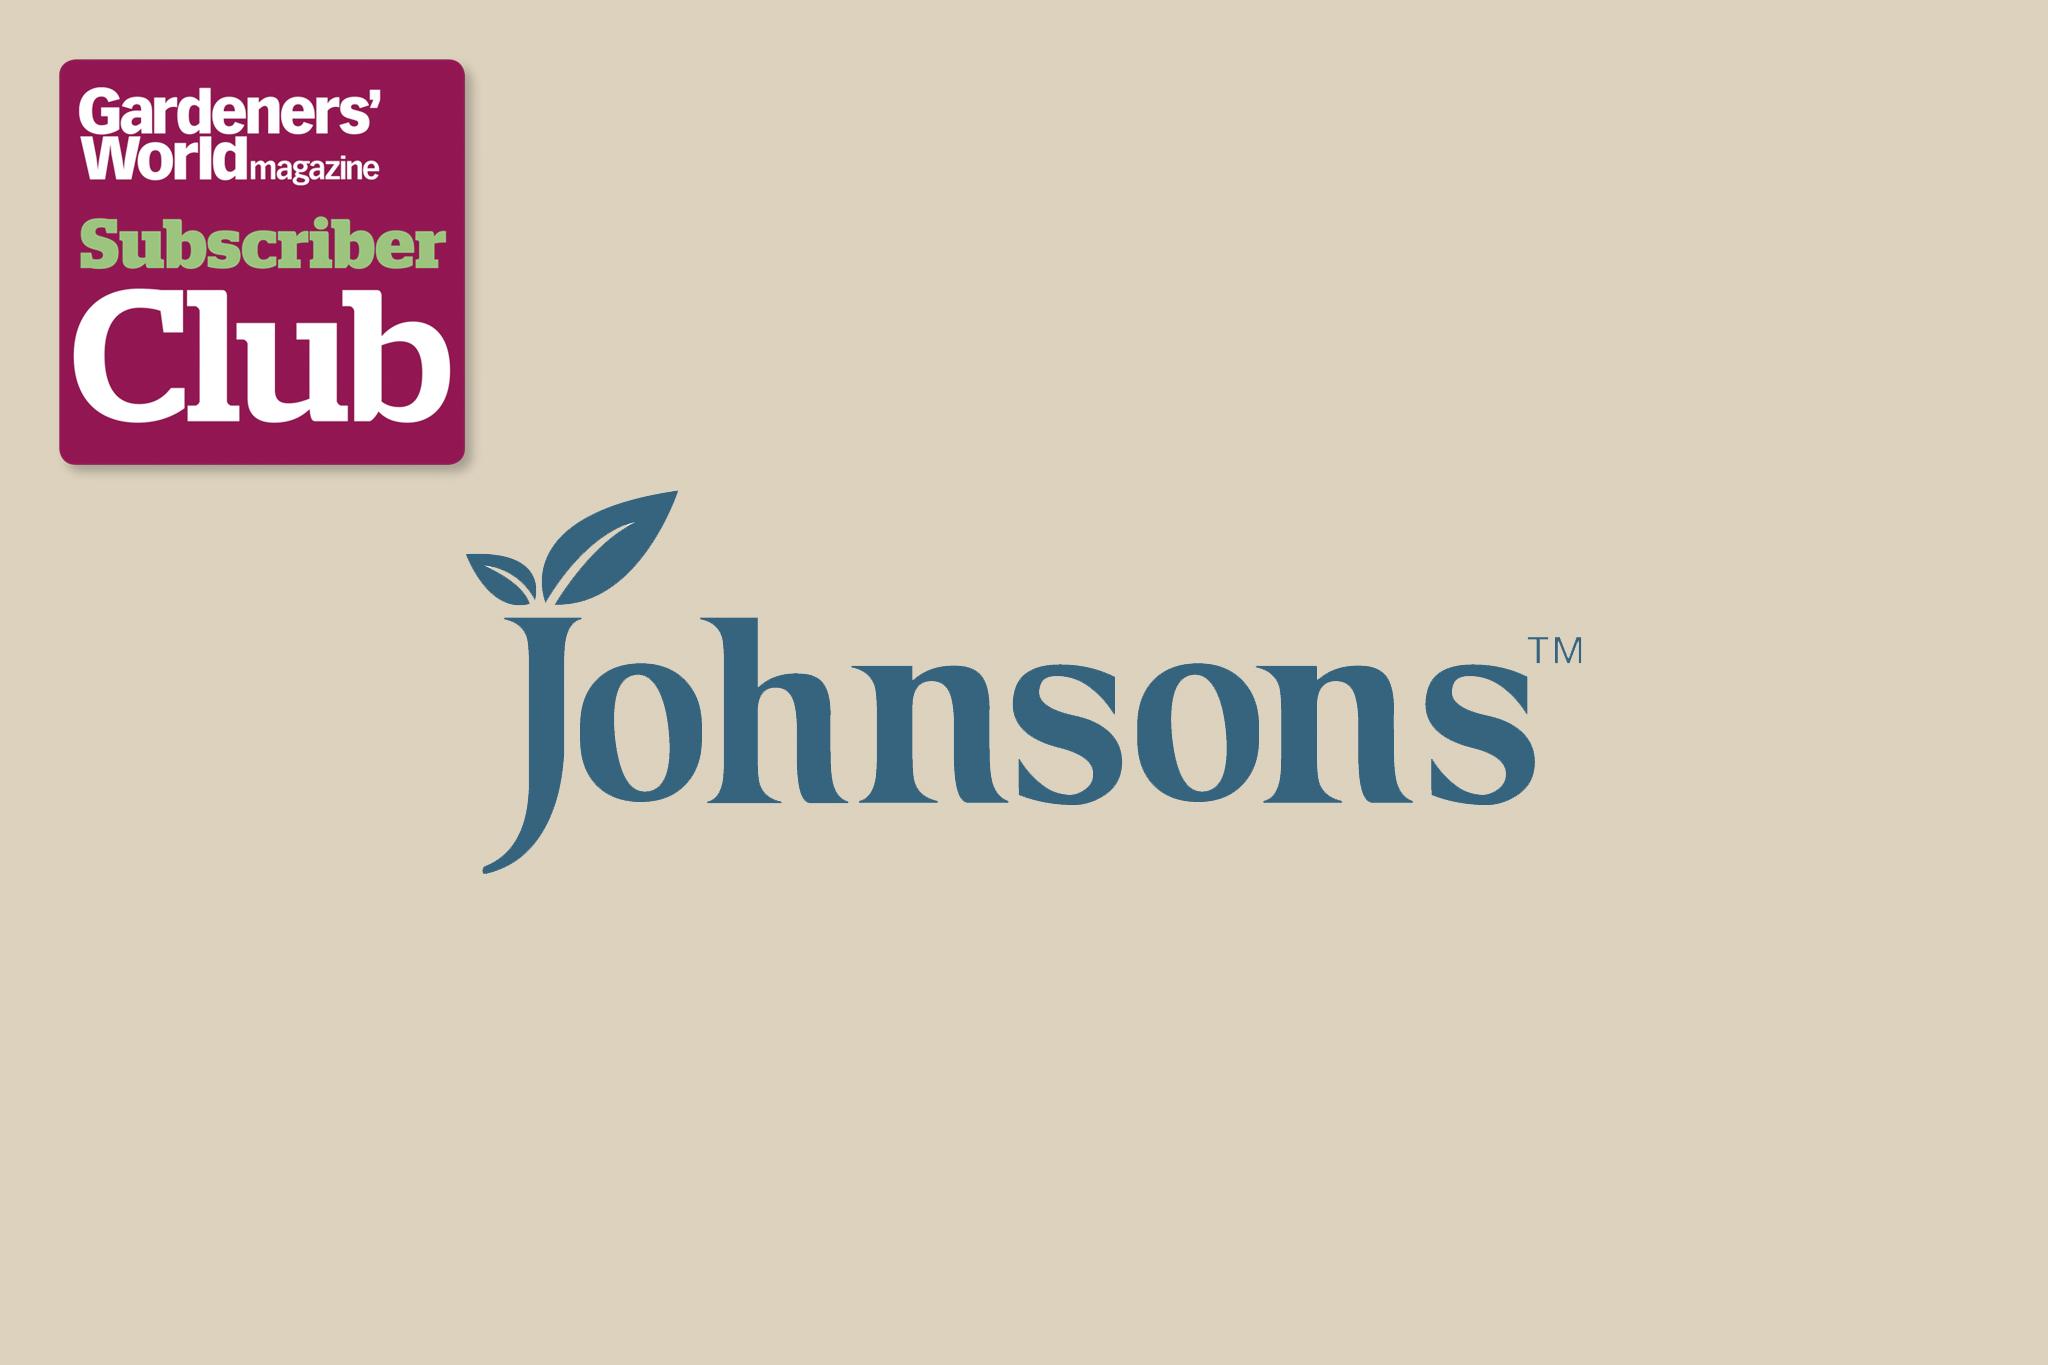 Johnsons BBC Gardeners' World Magazine Subscriber Club discount